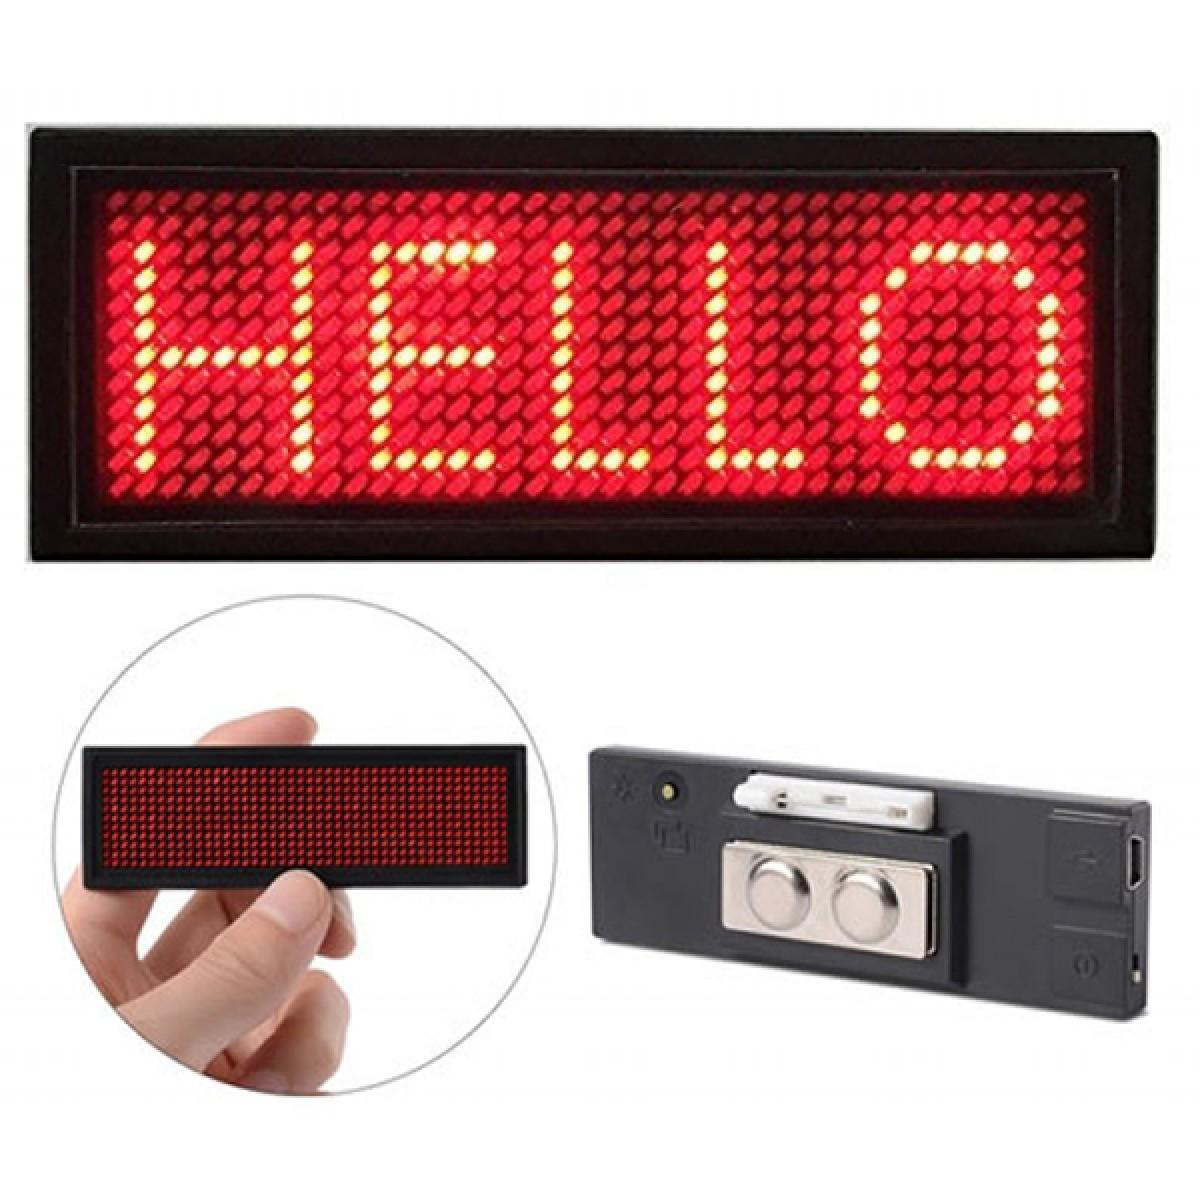 LED Ταμπελάκι τύπου κονκάρδα κυλιόμενων μηνυμάτων κόκκινο χρώμα 8x3cm B1236